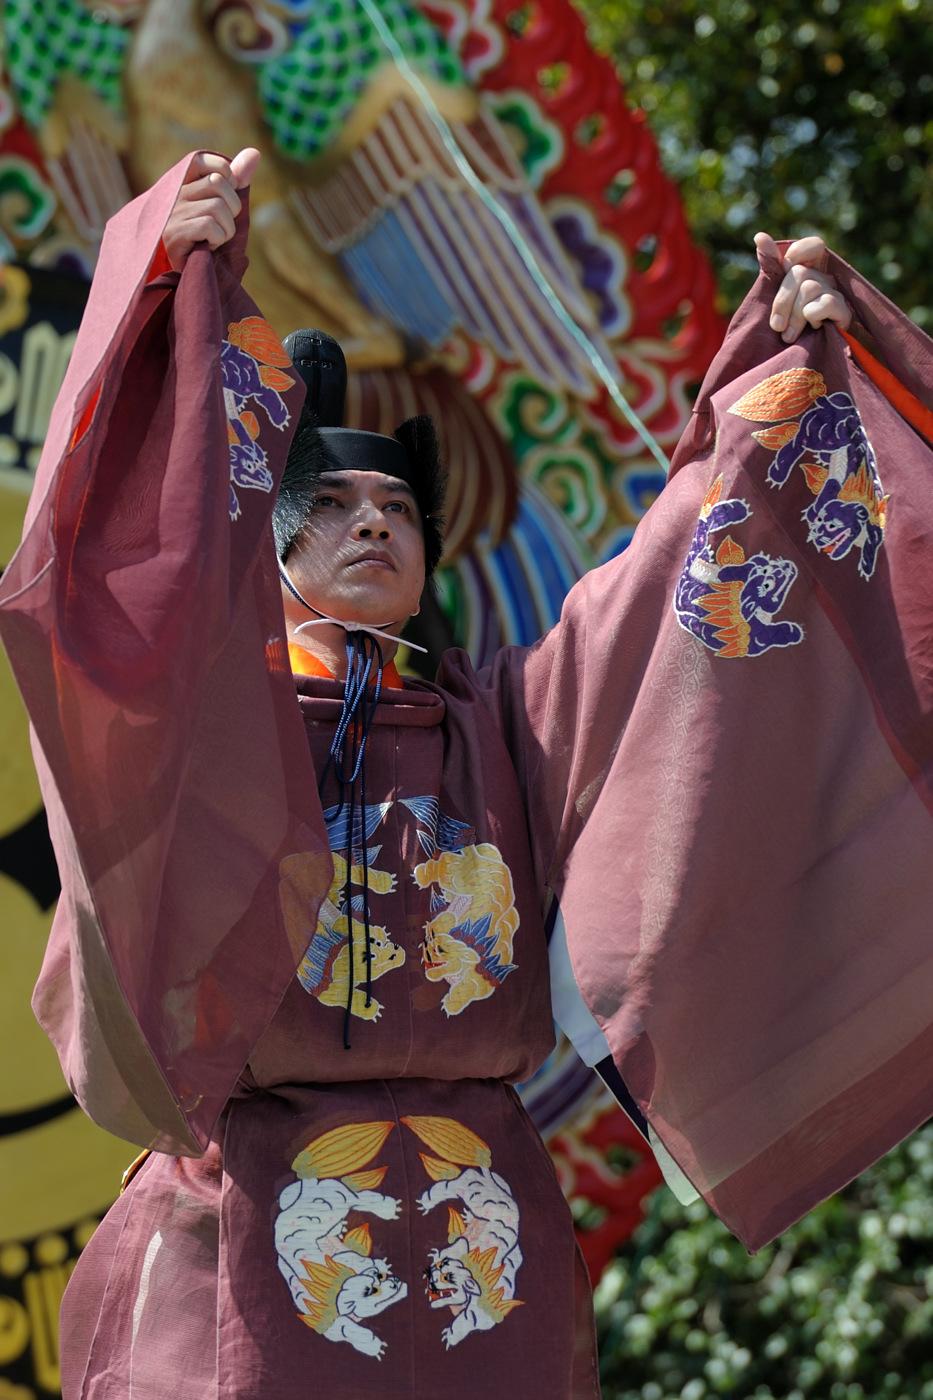 伊勢神宮の春季神楽祭の男性